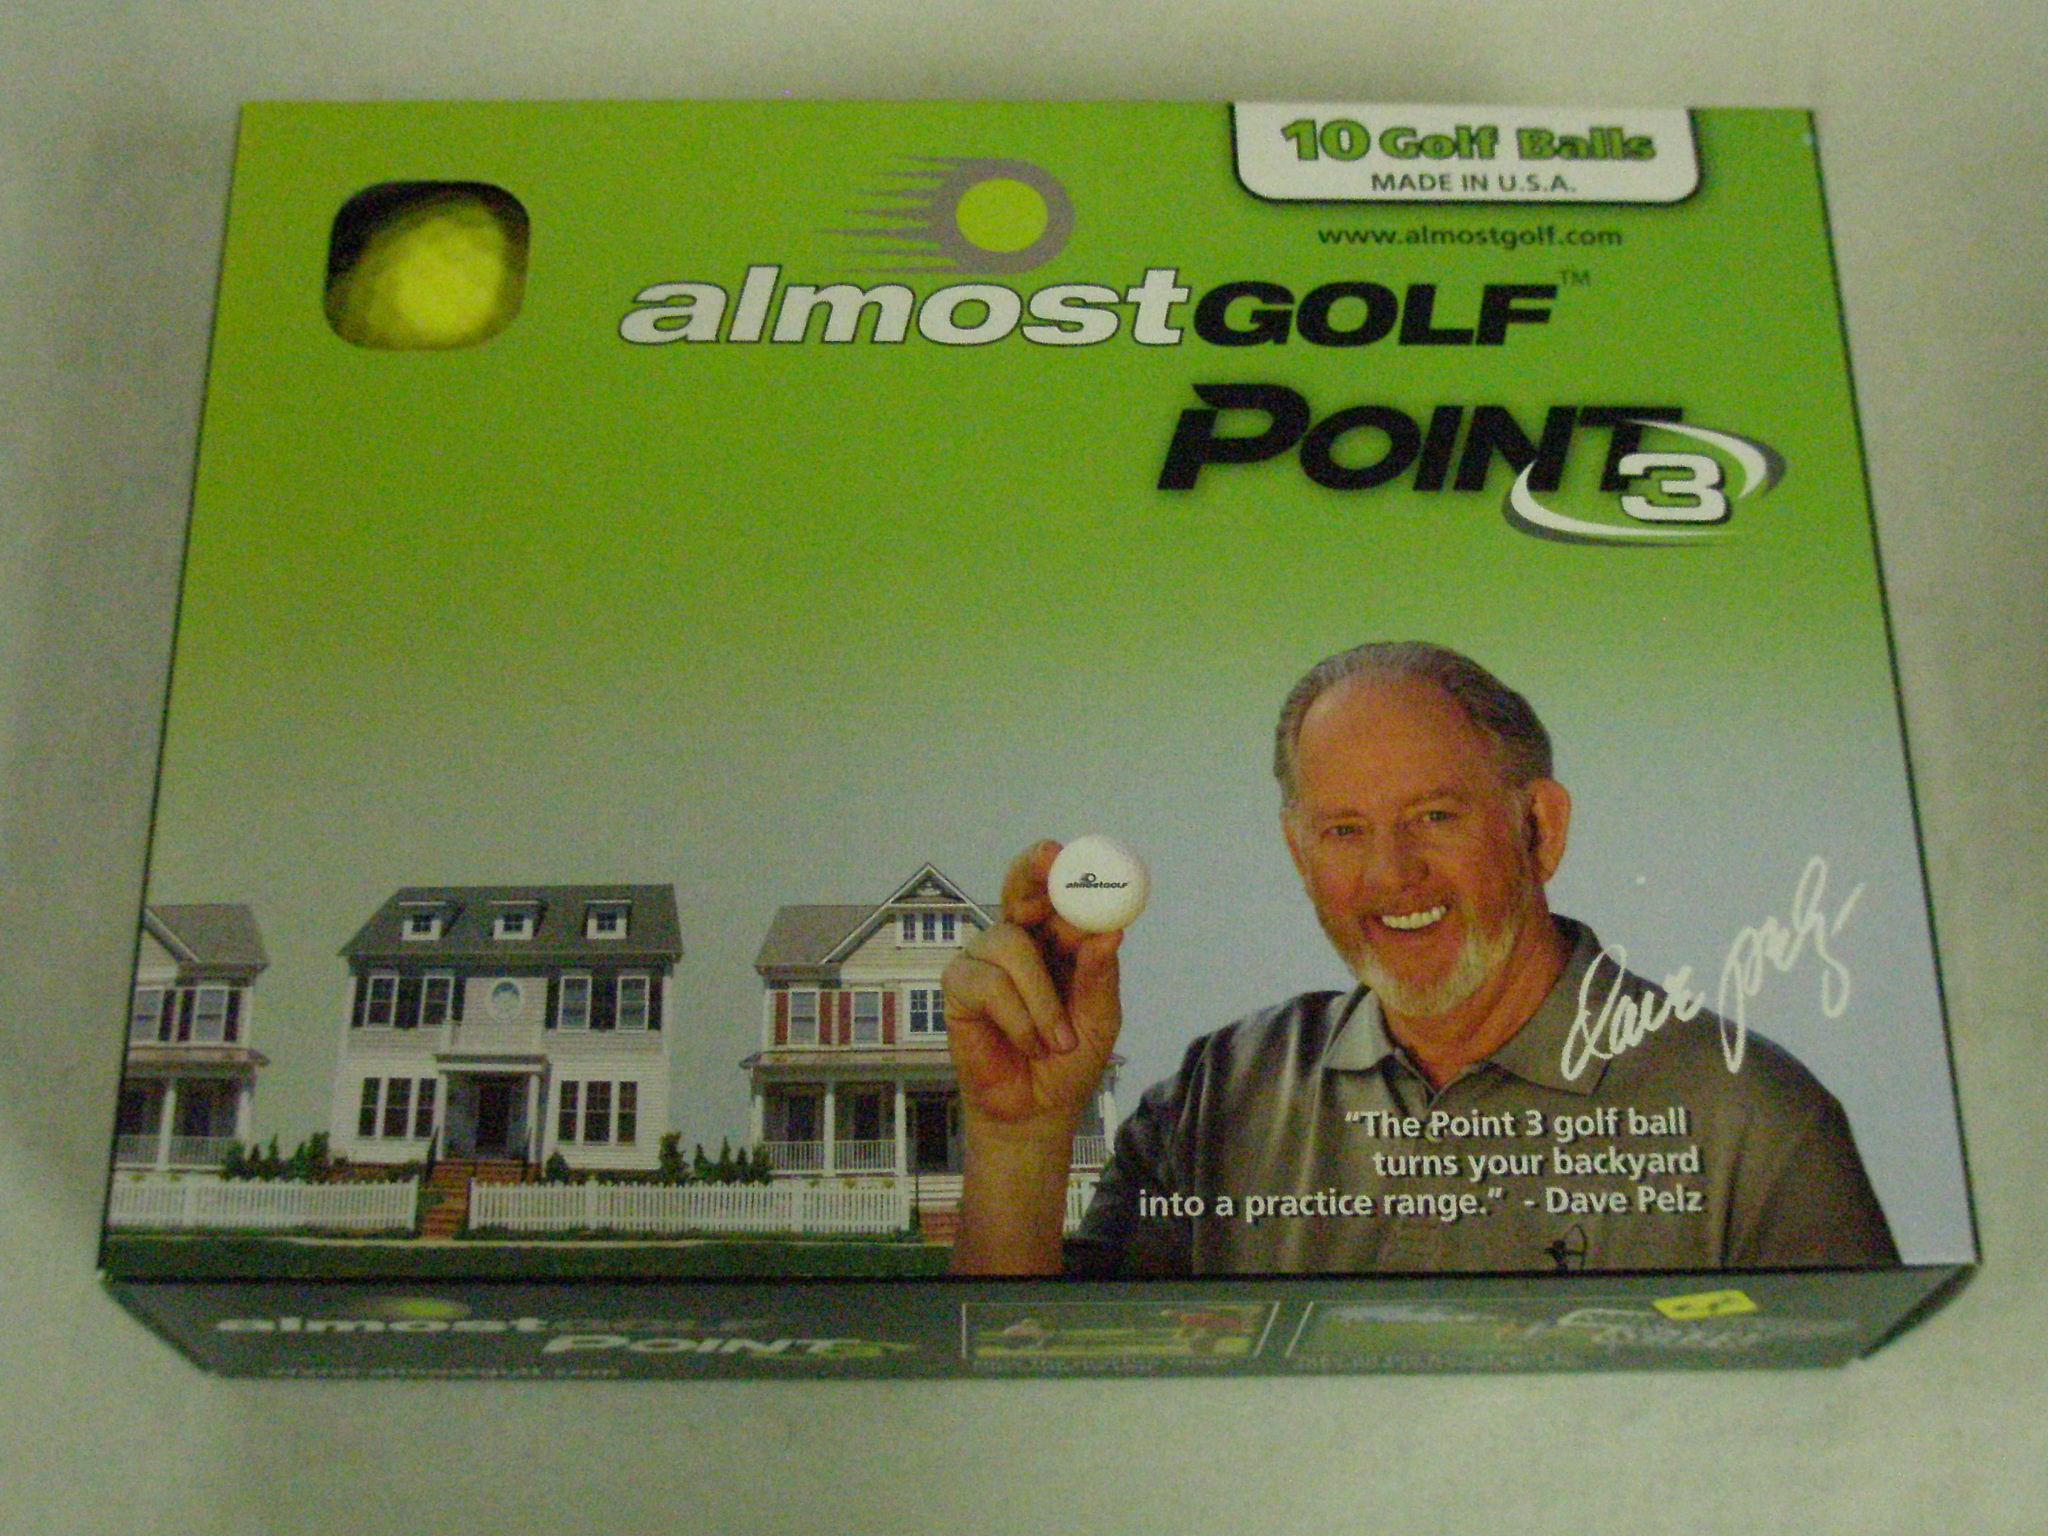 3 golf balls almost - 4 2